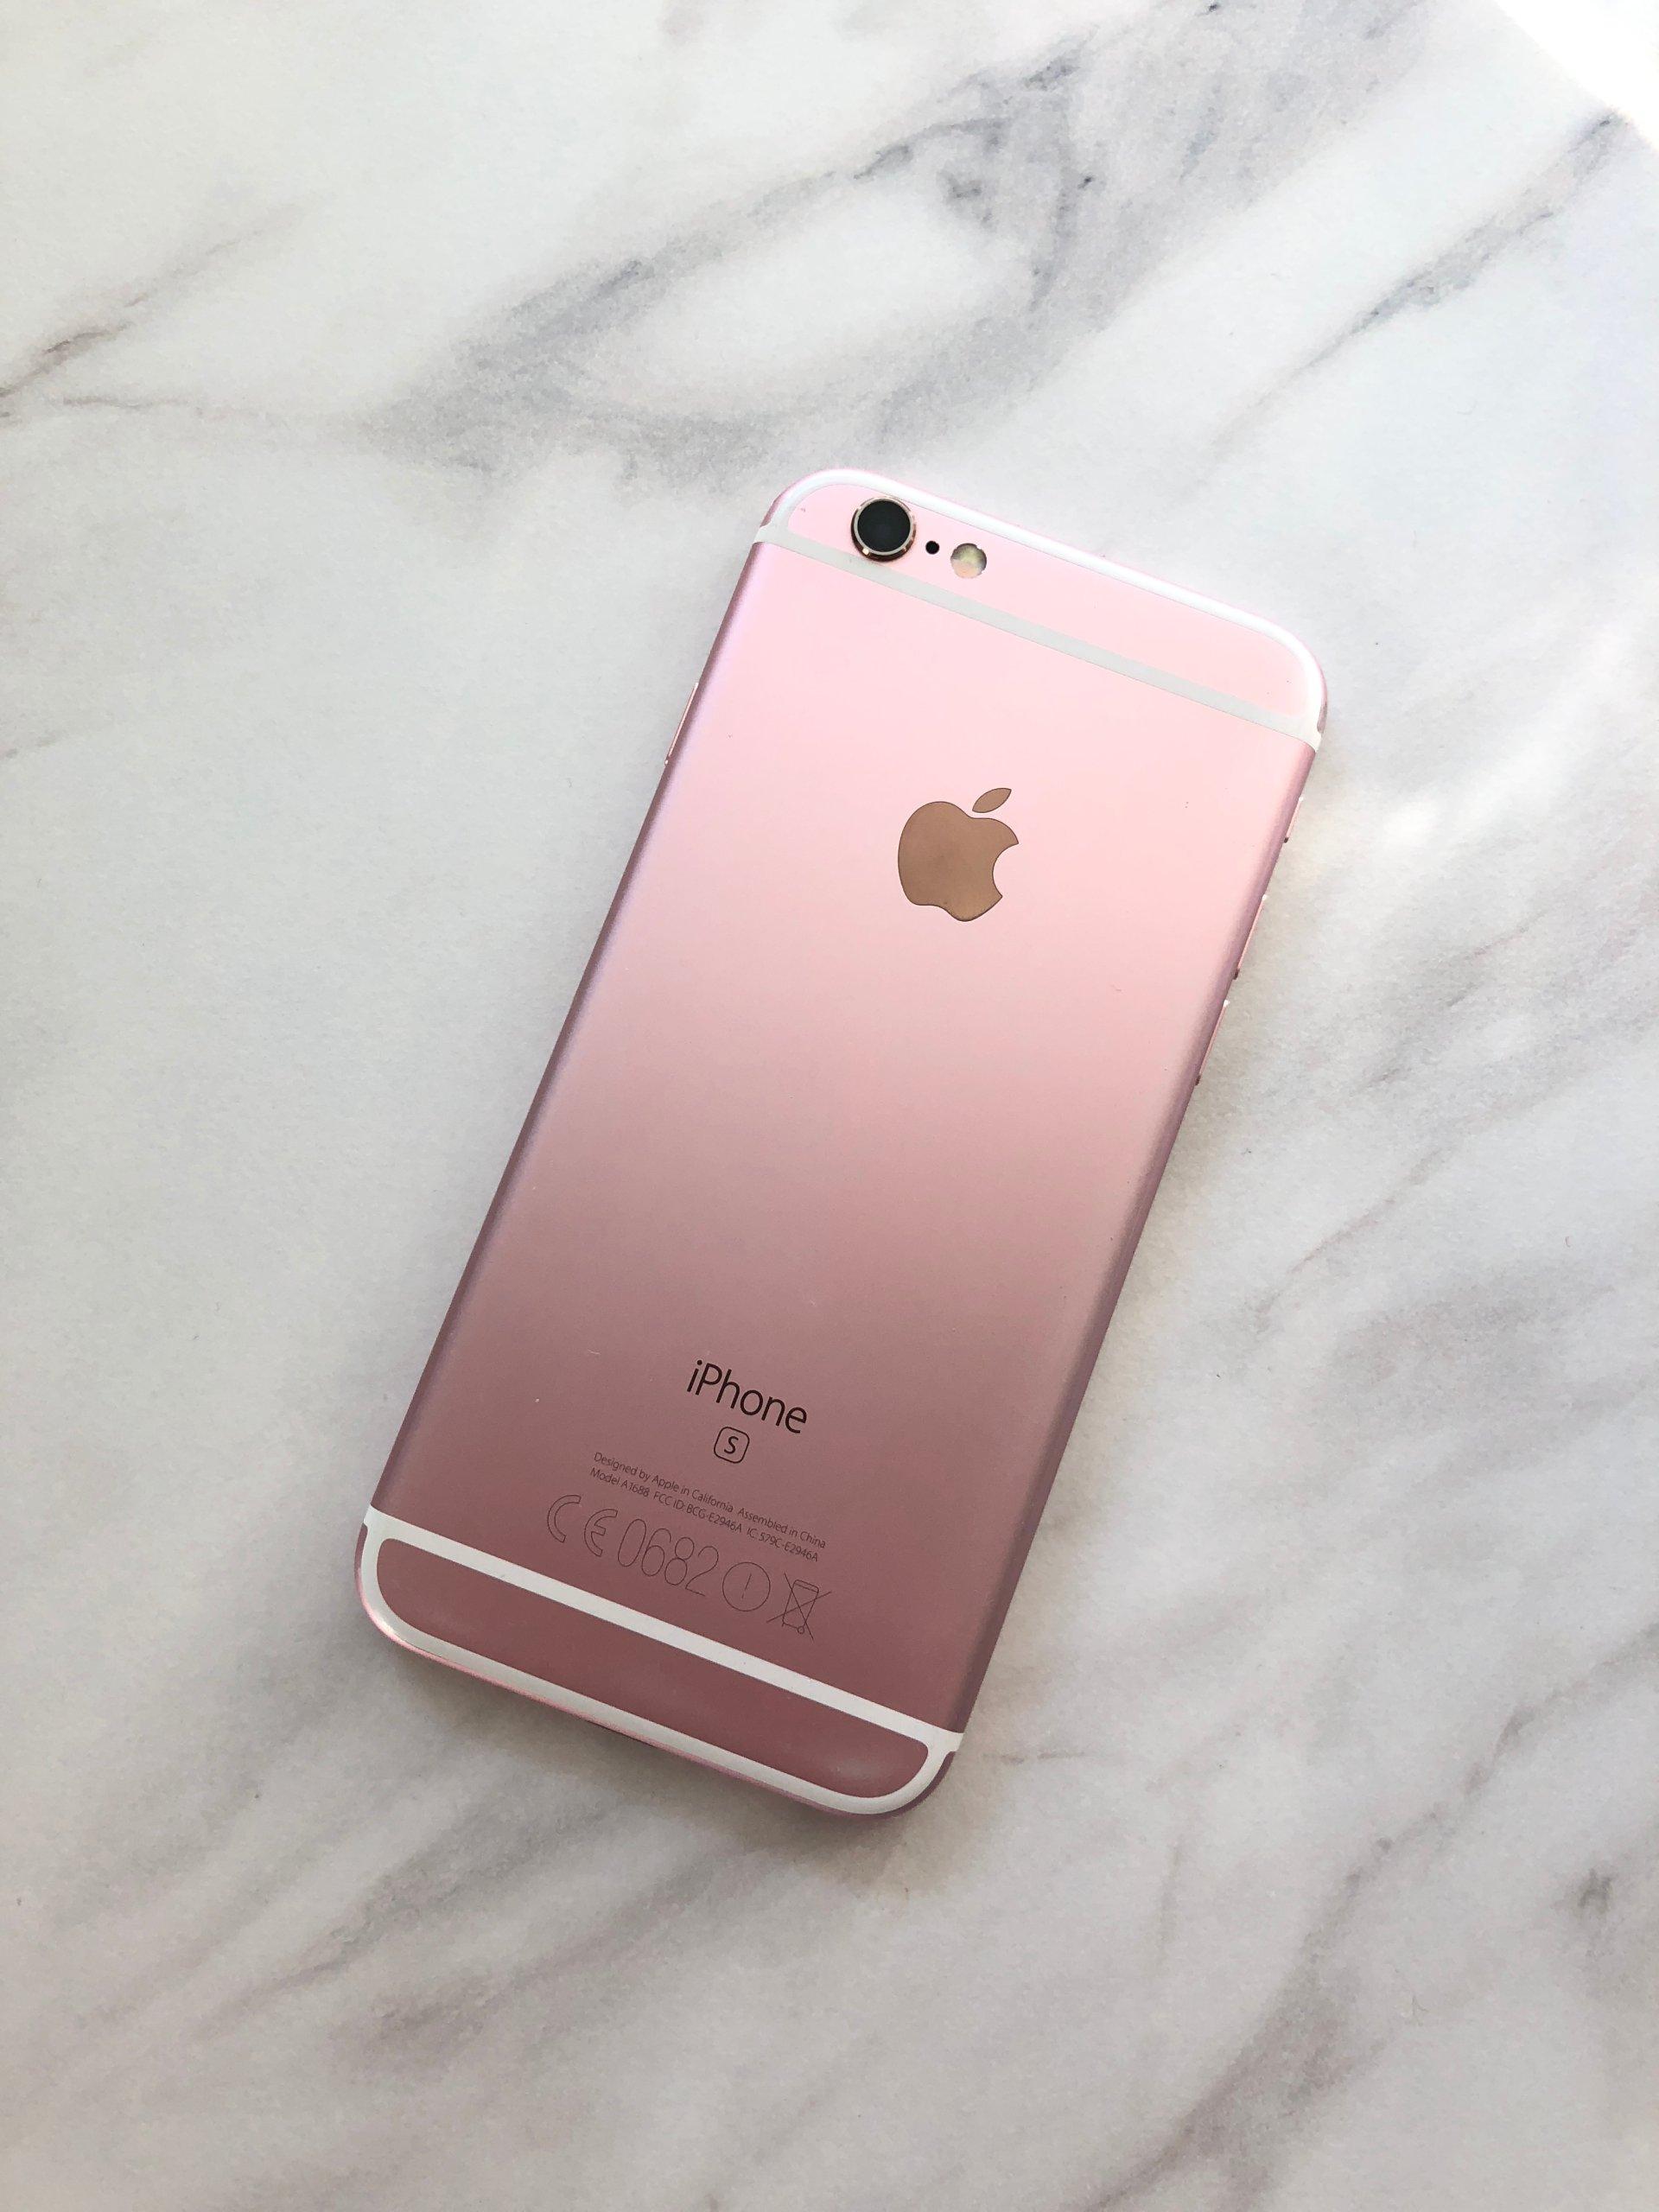 iPhone 6s Rose Gold 16GB od 1zł 6 s Apple gratis